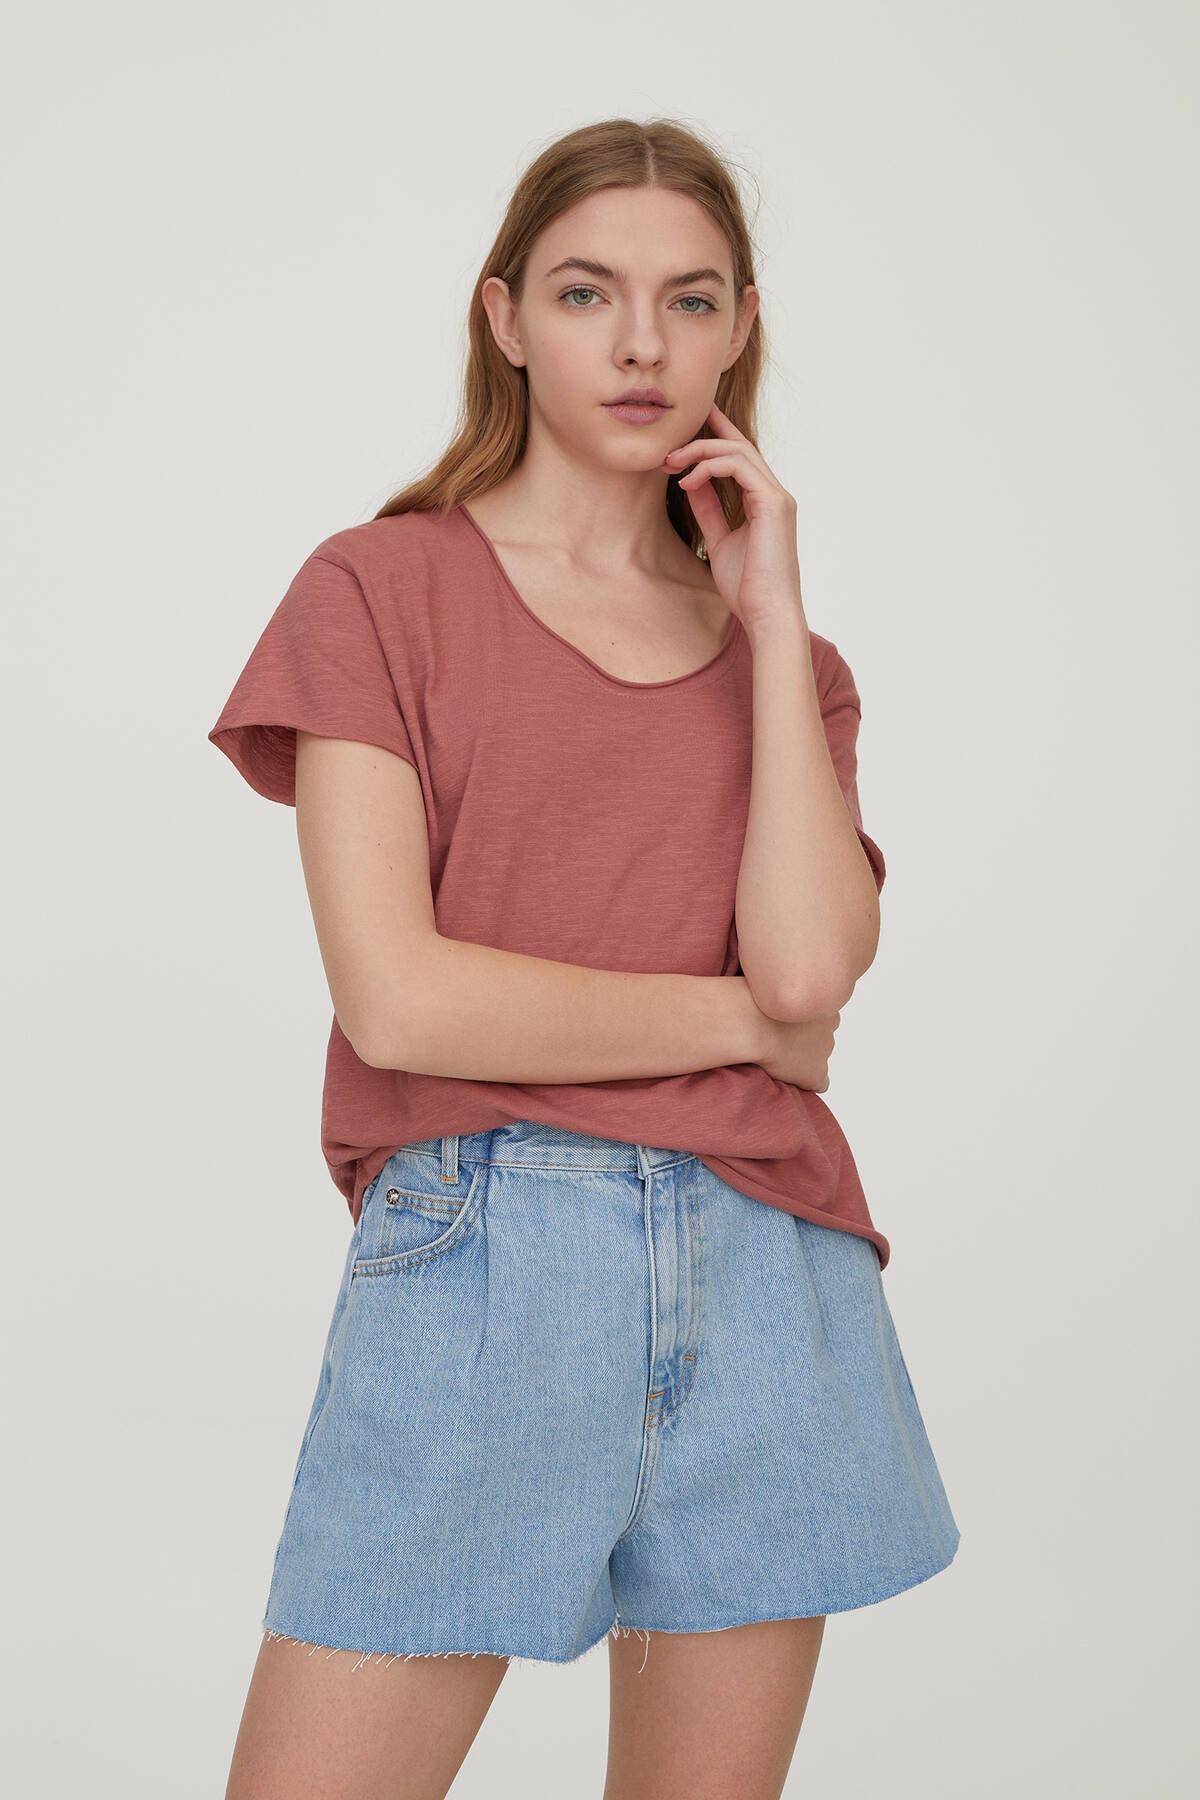 Pull & Bear Kadın Kil Rengi Biyeli Dikişli Basic T-Shirt 05236307 1